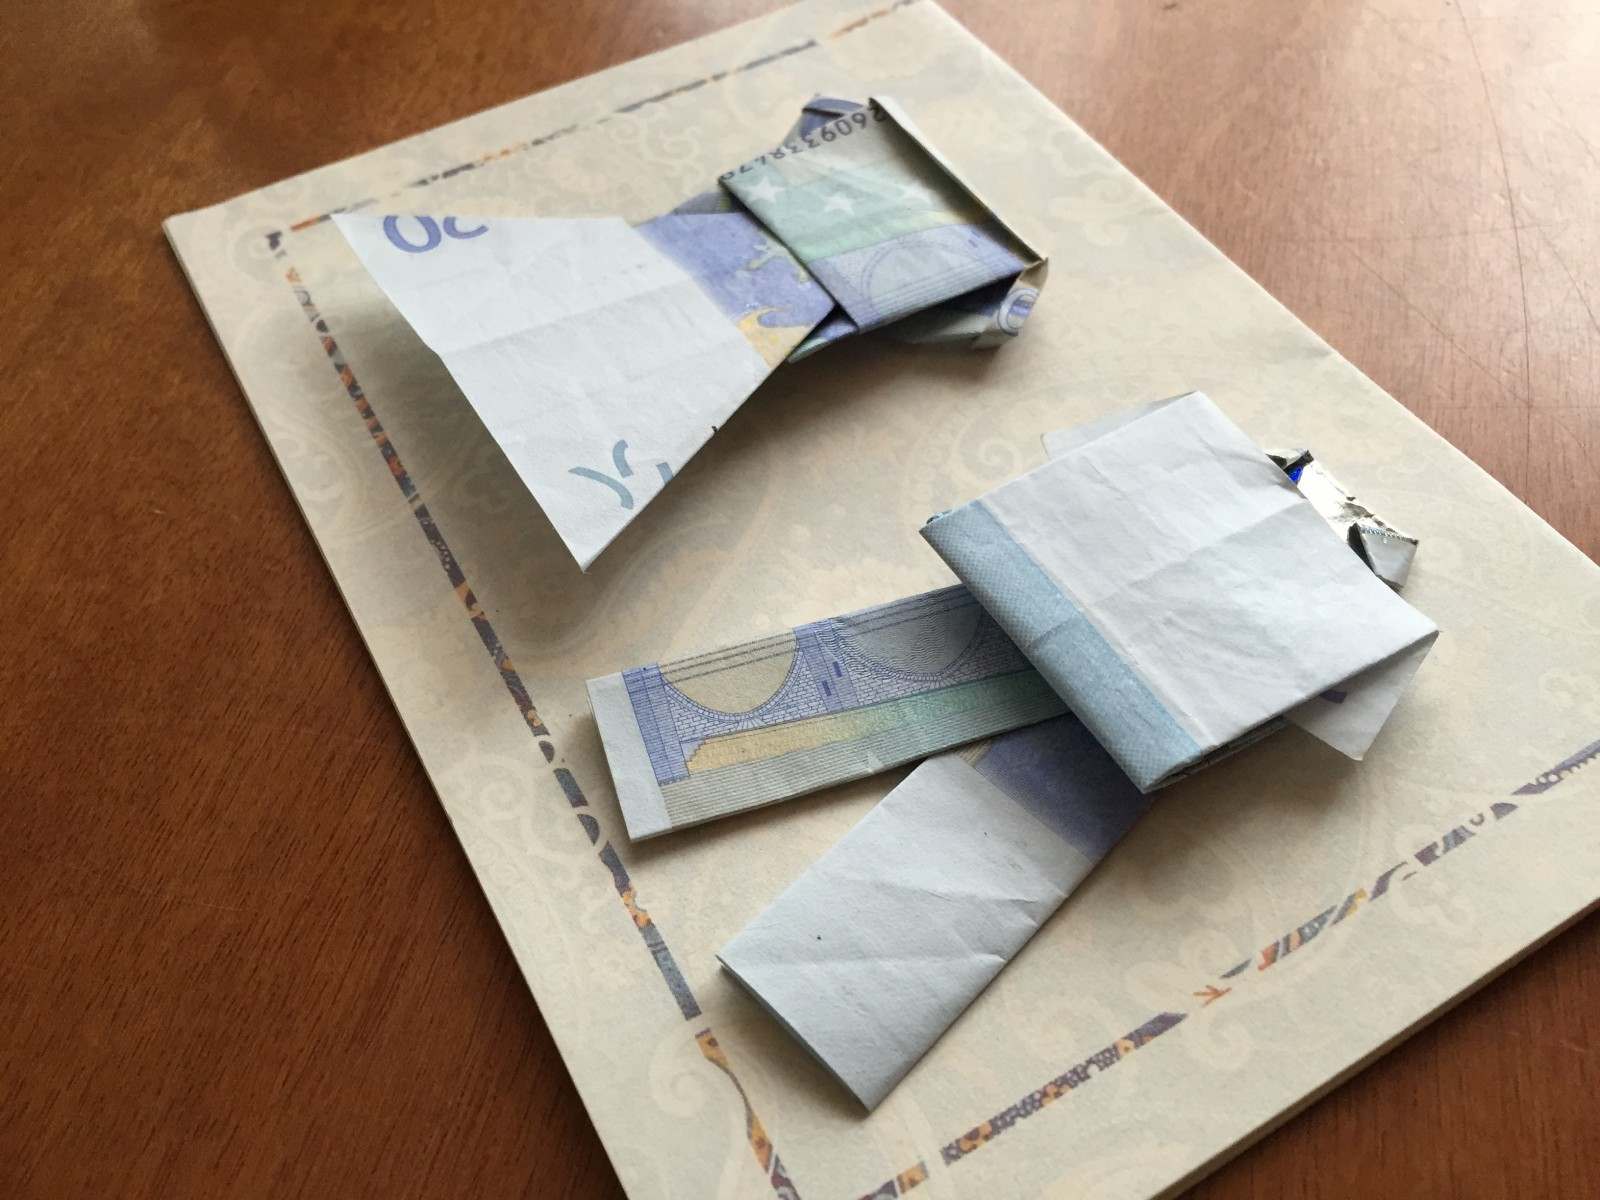 Famoso Idee eleganti per regalare soldi | Blog di CreAttivamenteLulù VE12